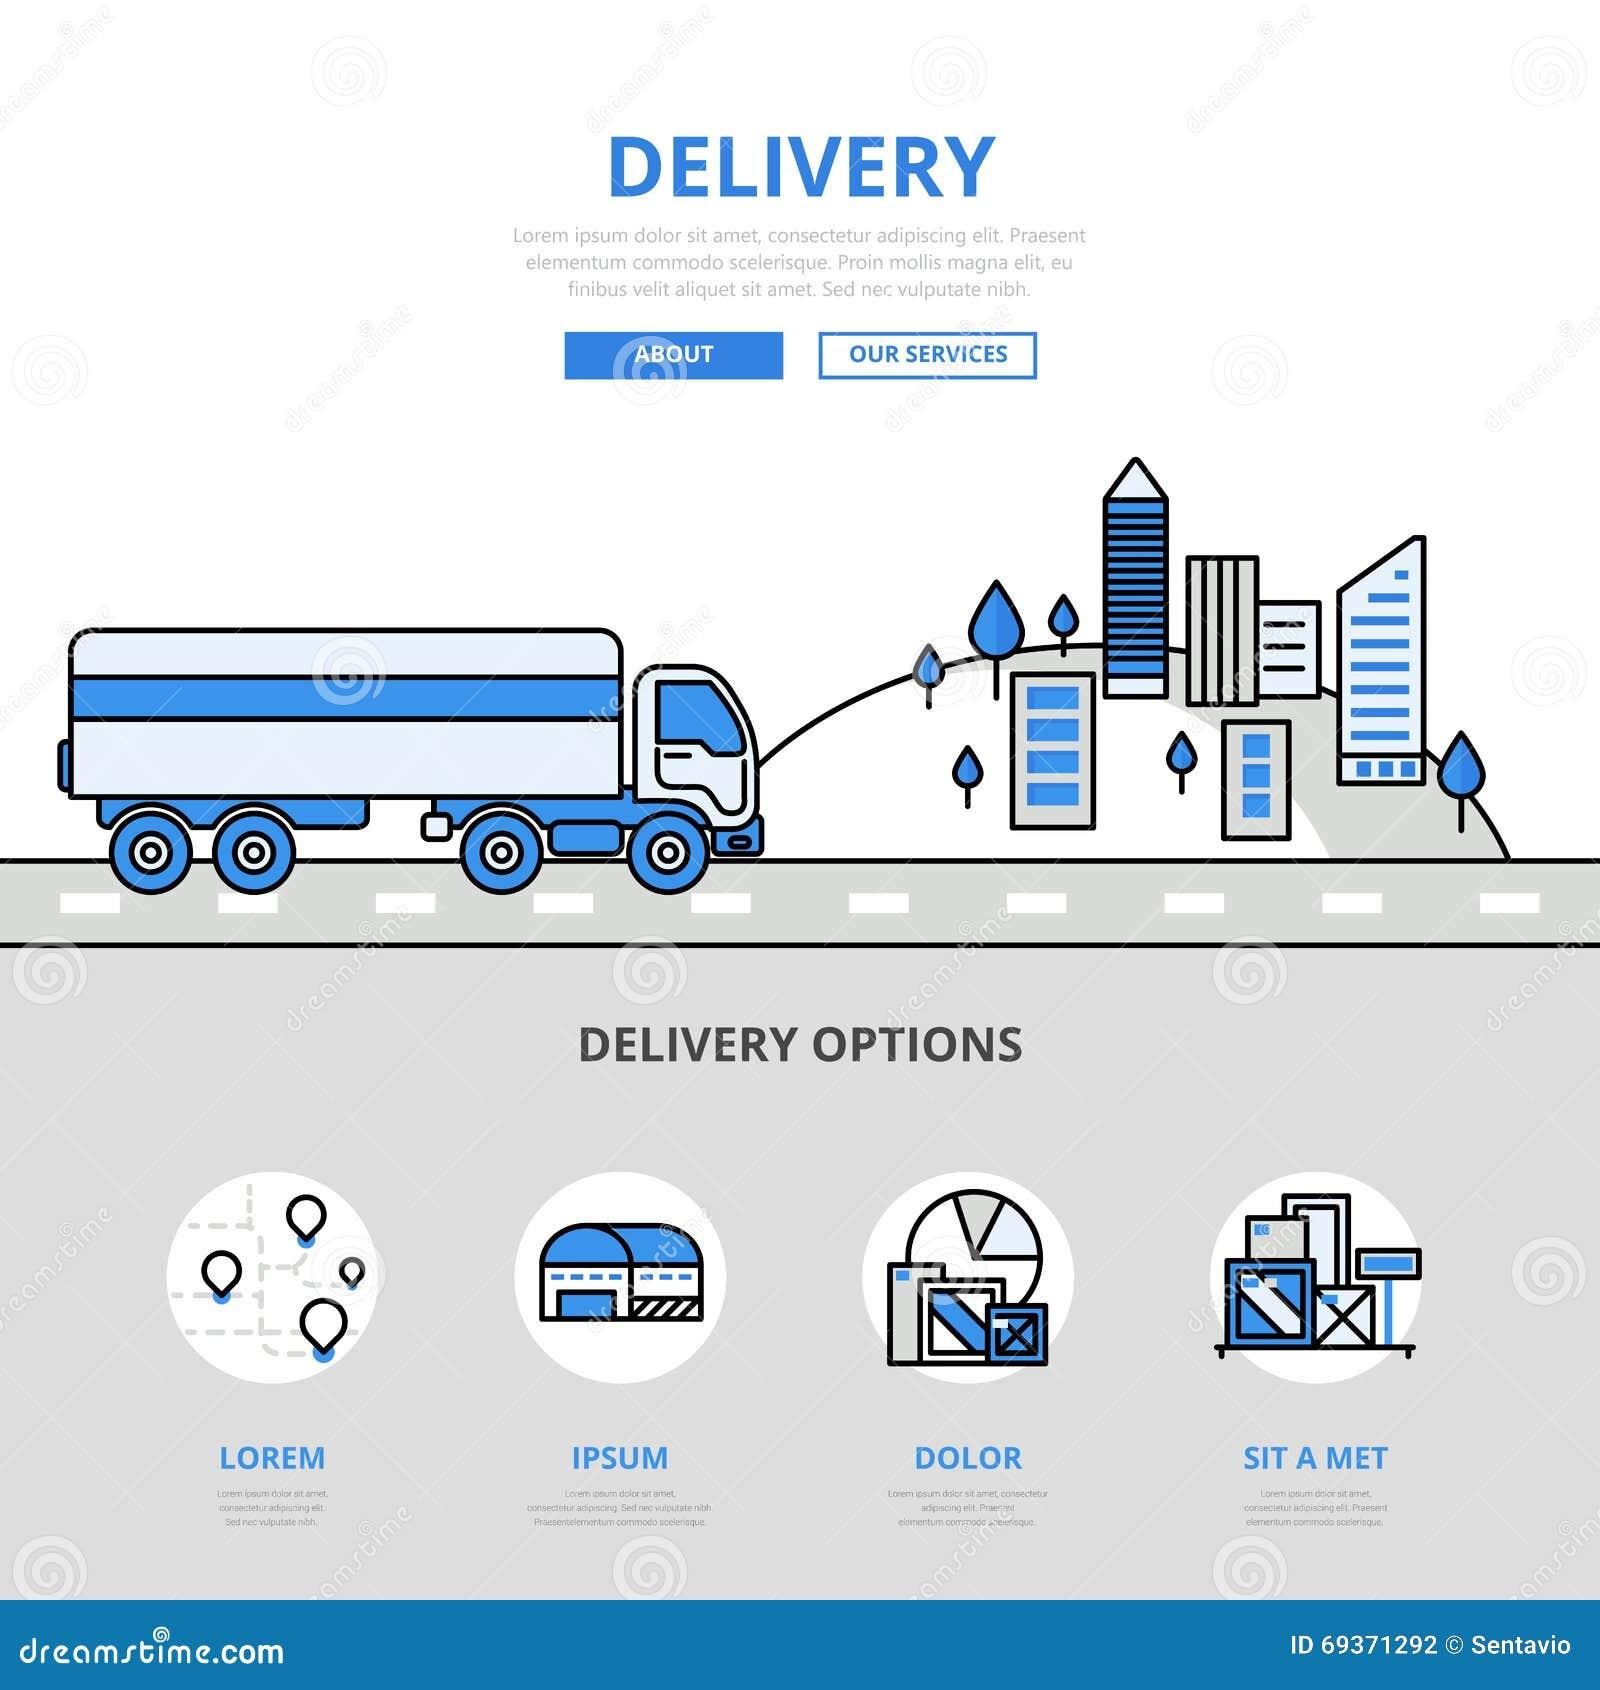 Line Art Website : Delivery road transport banner line art vector icons